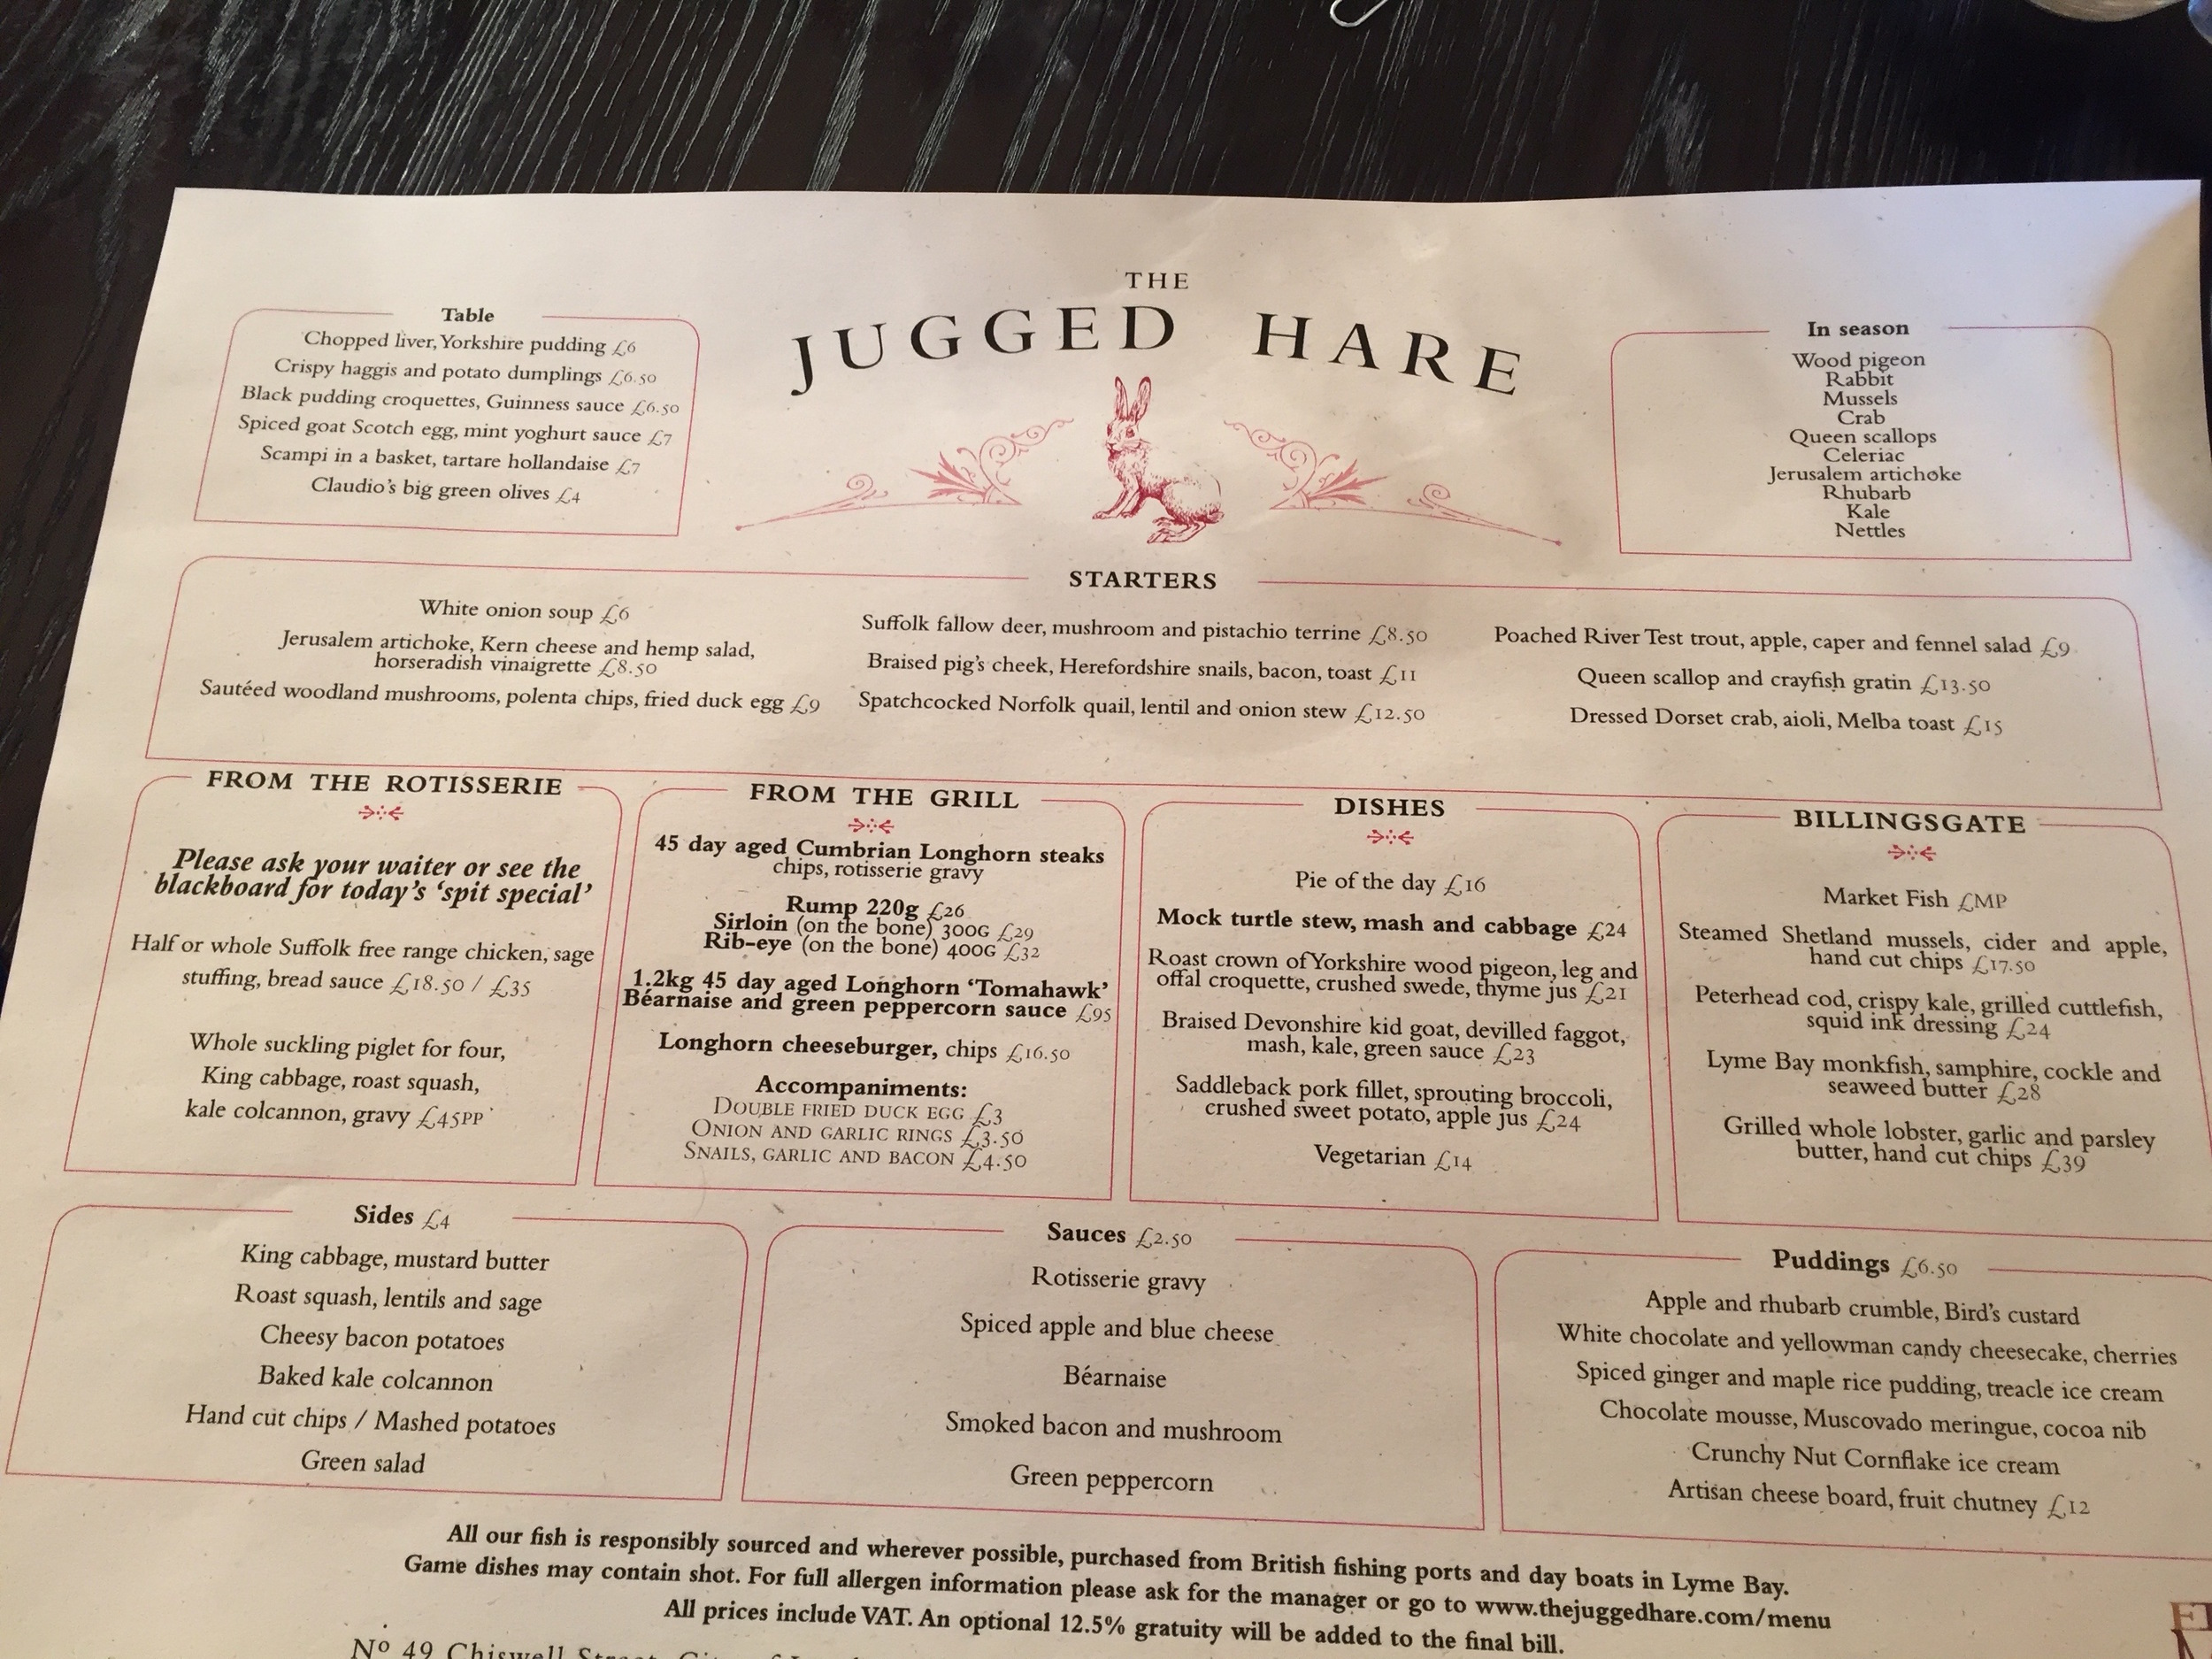 The Jugged Hare menu